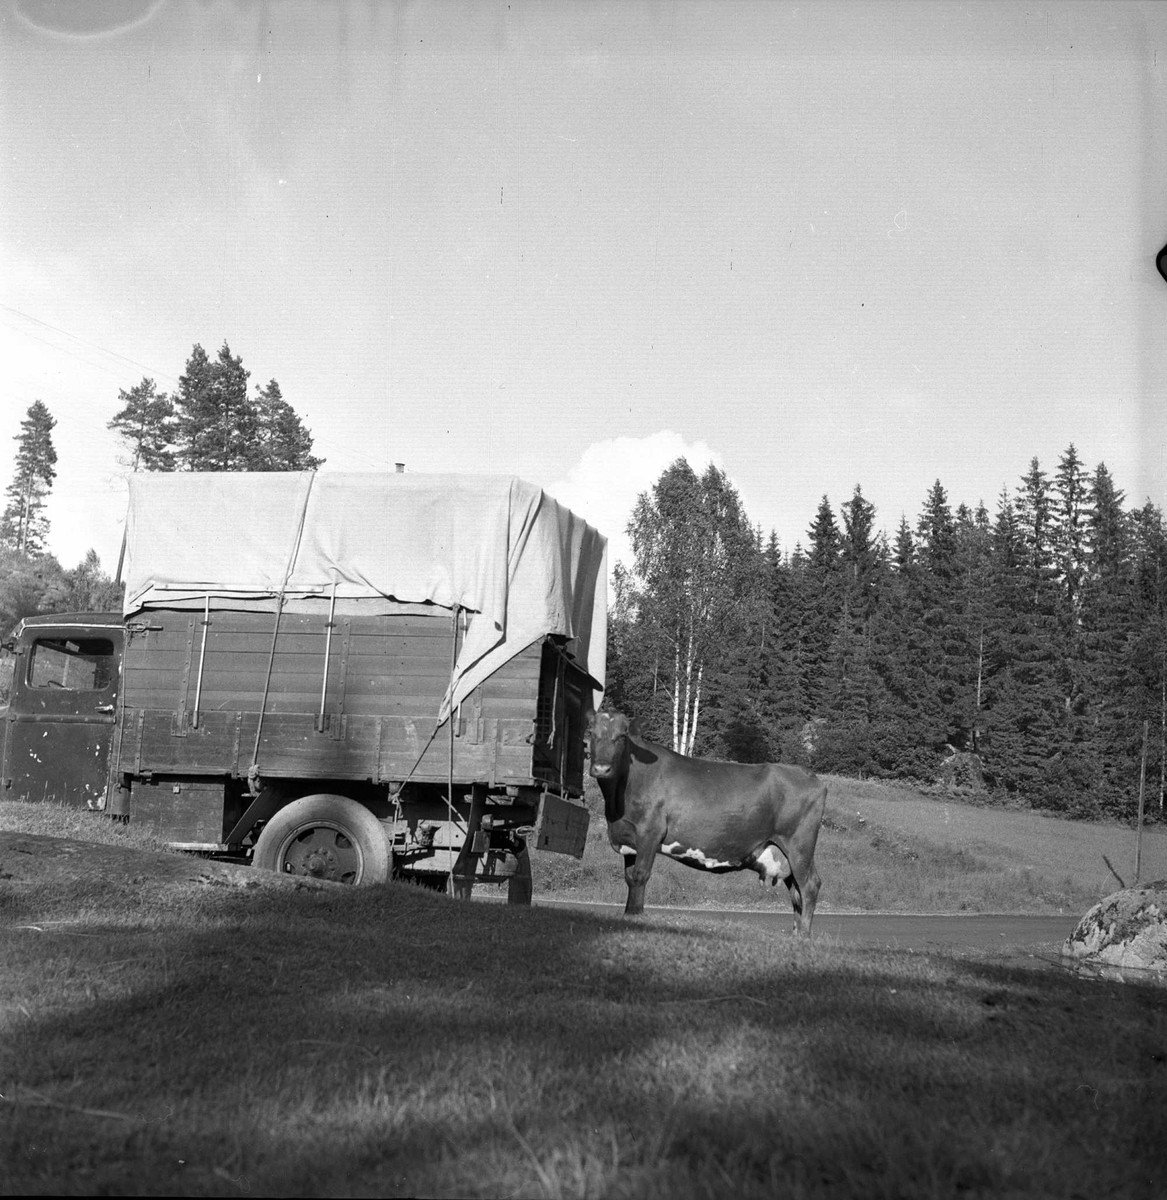 Sinsen, Oslo, juli 1954. Lastebil og ku.